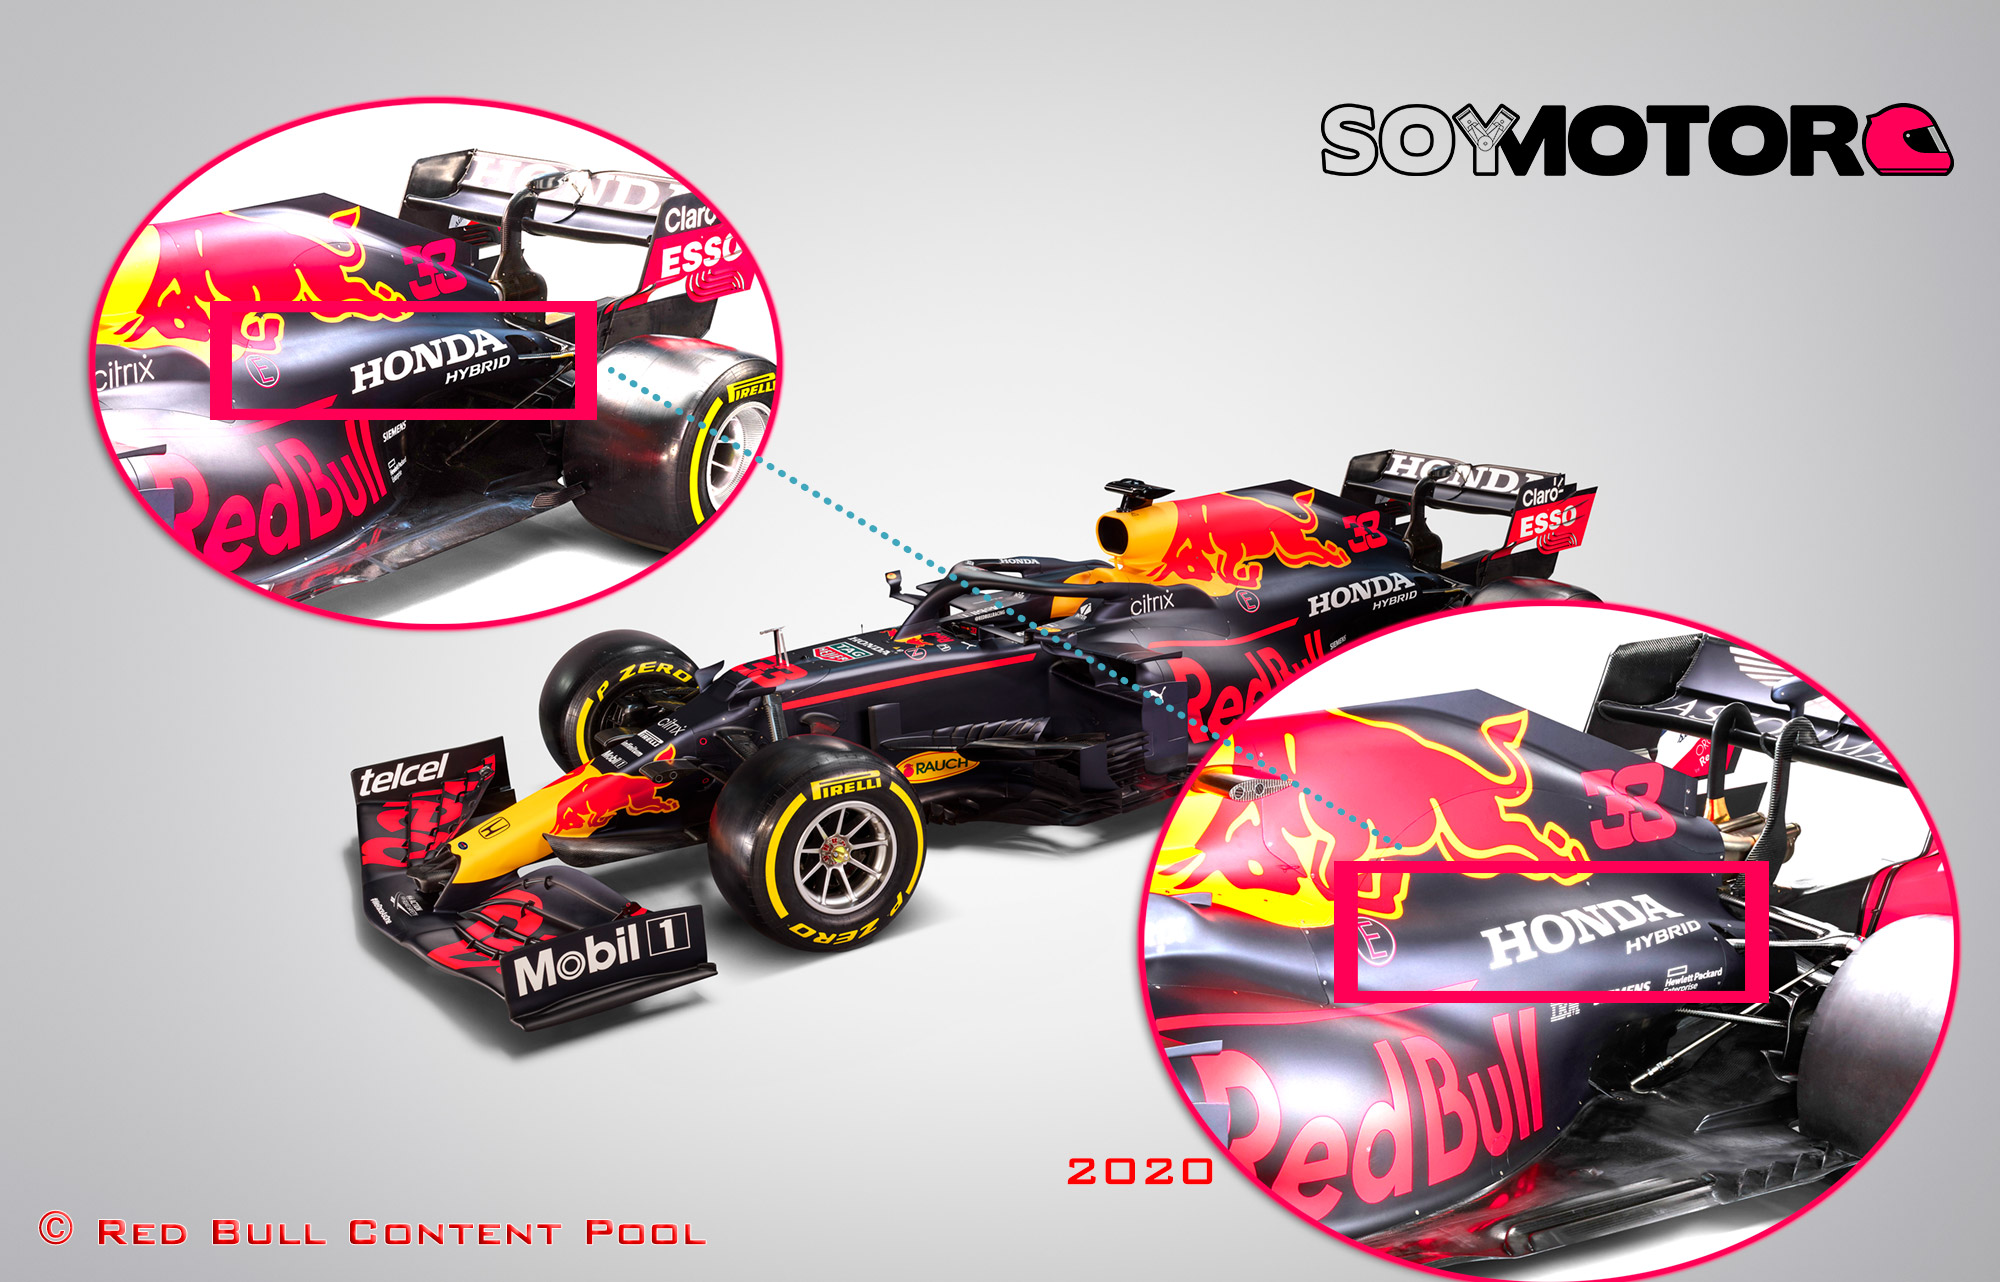 red-bull-tapa-motor-soymotor.jpg